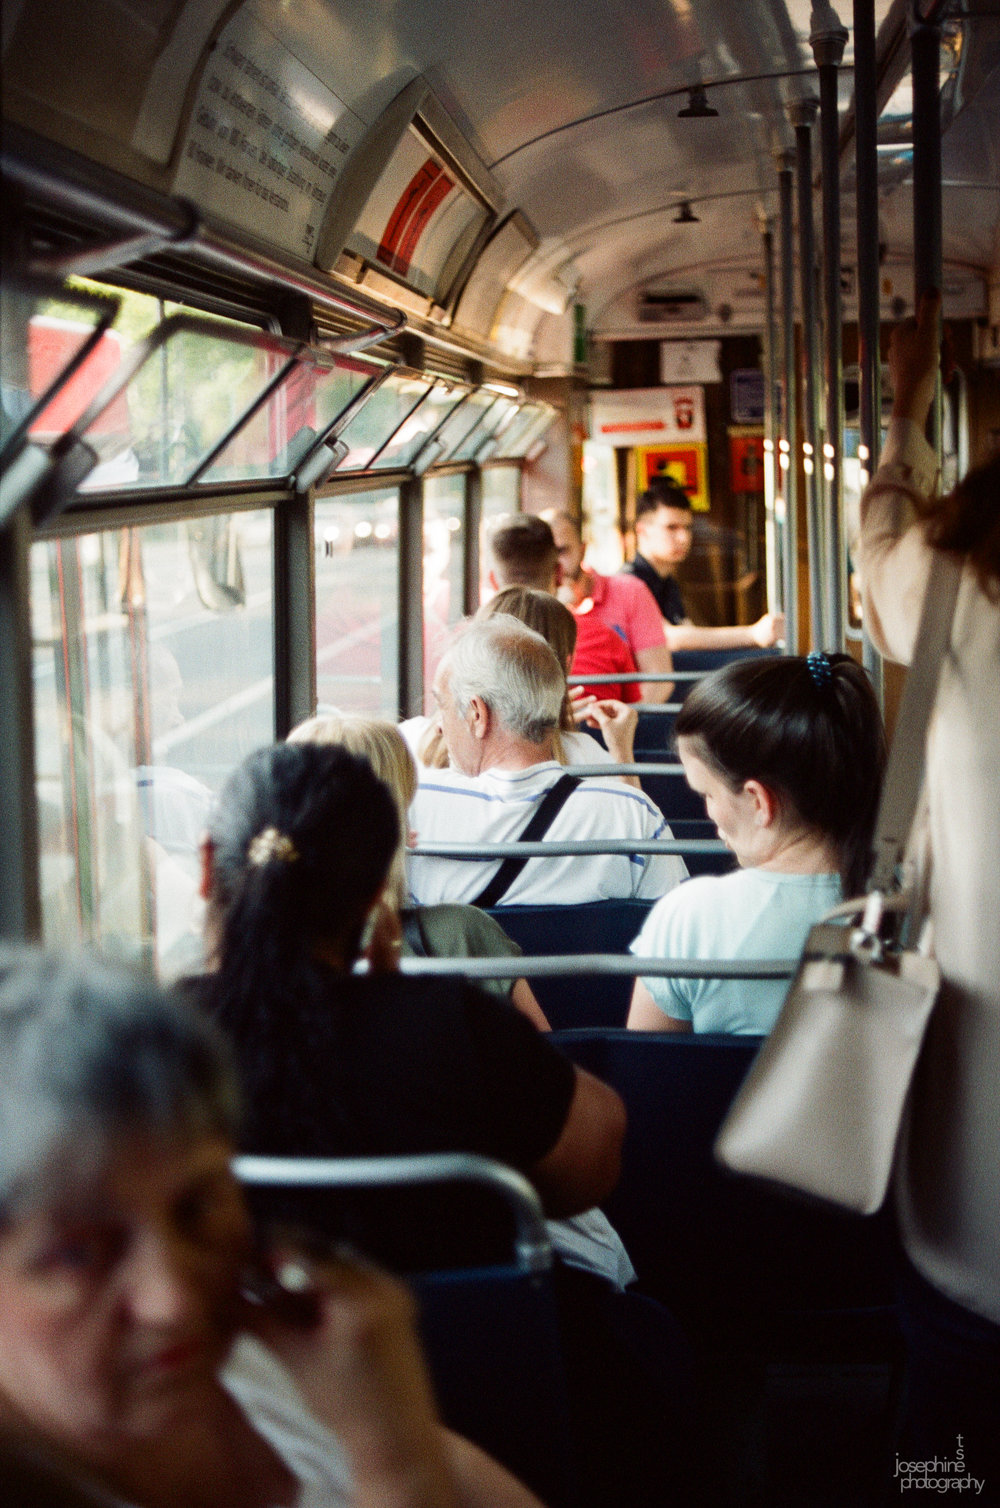 Streetcar in Beograd  Beograd, Serbia, 05/18